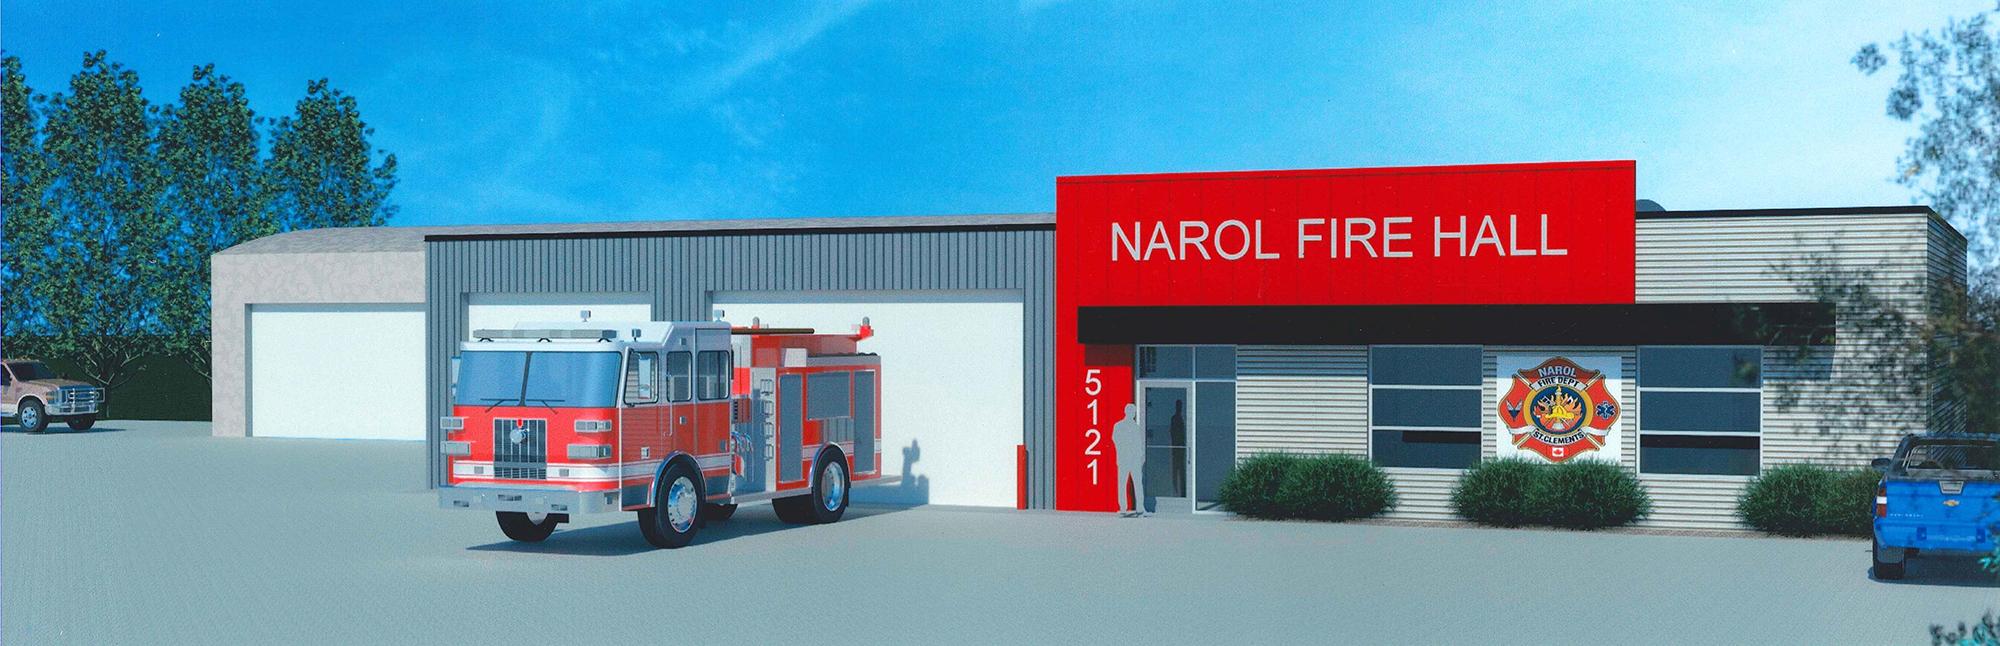 narol-fire-hall-expansion-design